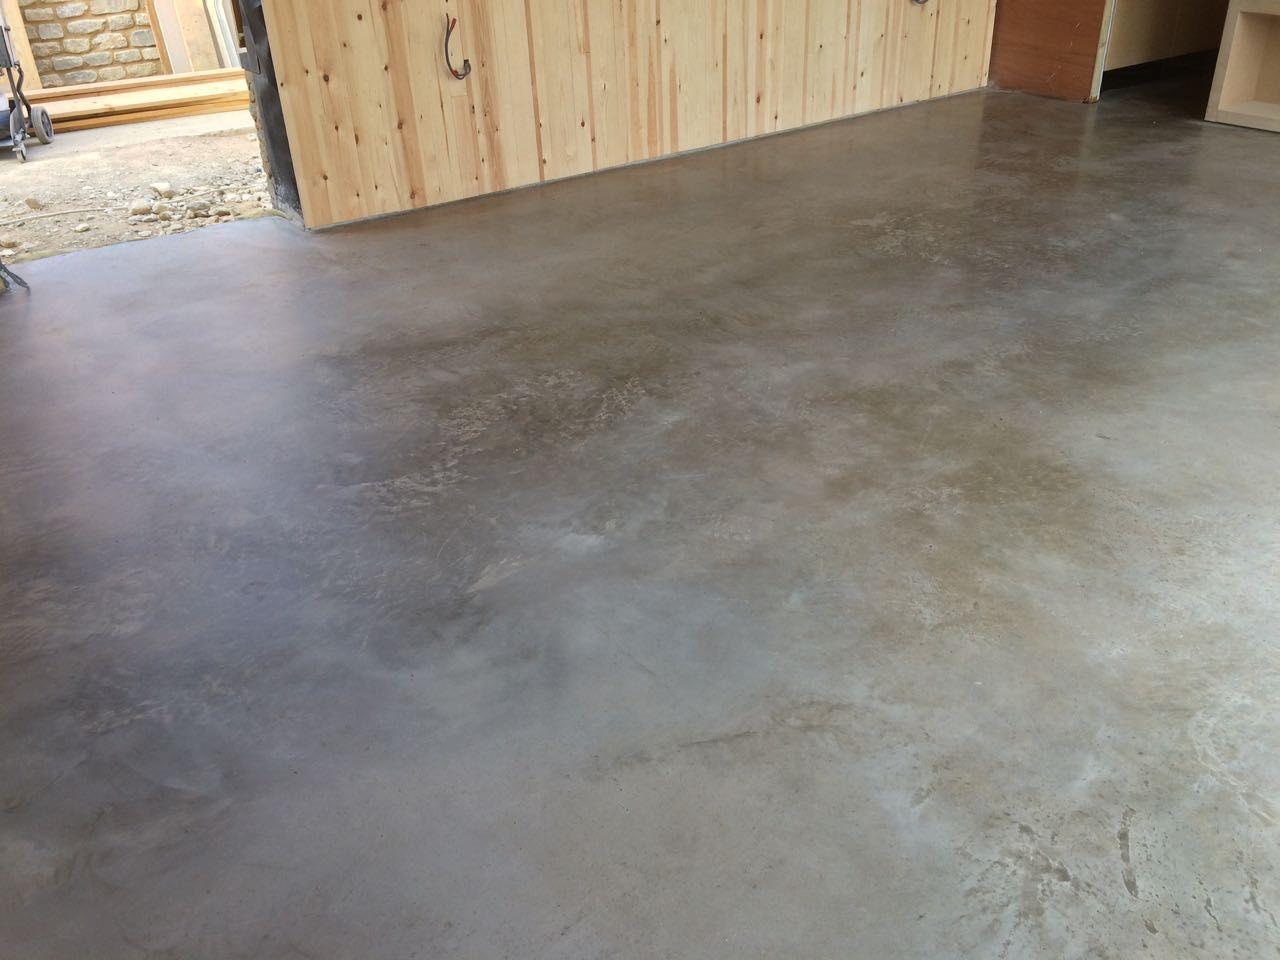 Polished Concrete Flooring In Leicester By Carrcrete The Uk S Experts Plancher En Beton Poli Beton Poli Plancher